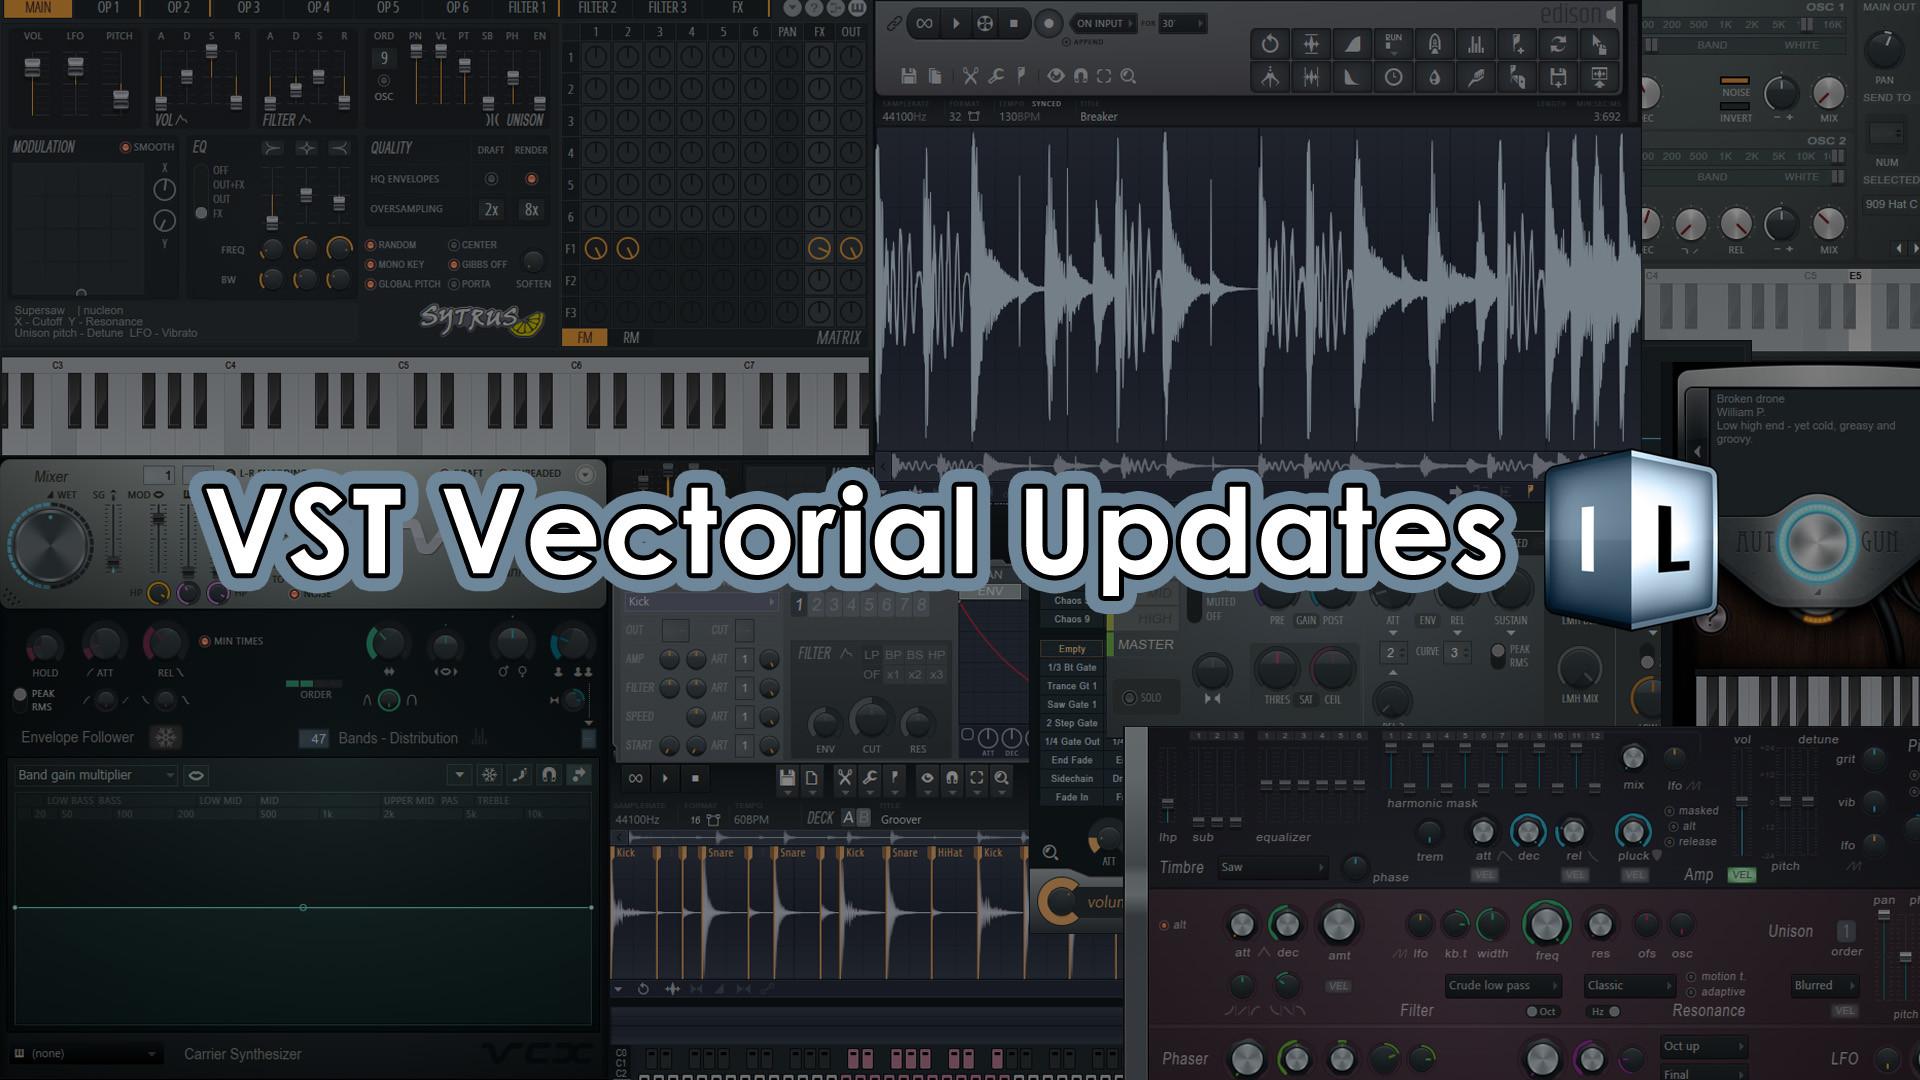 VST Updates